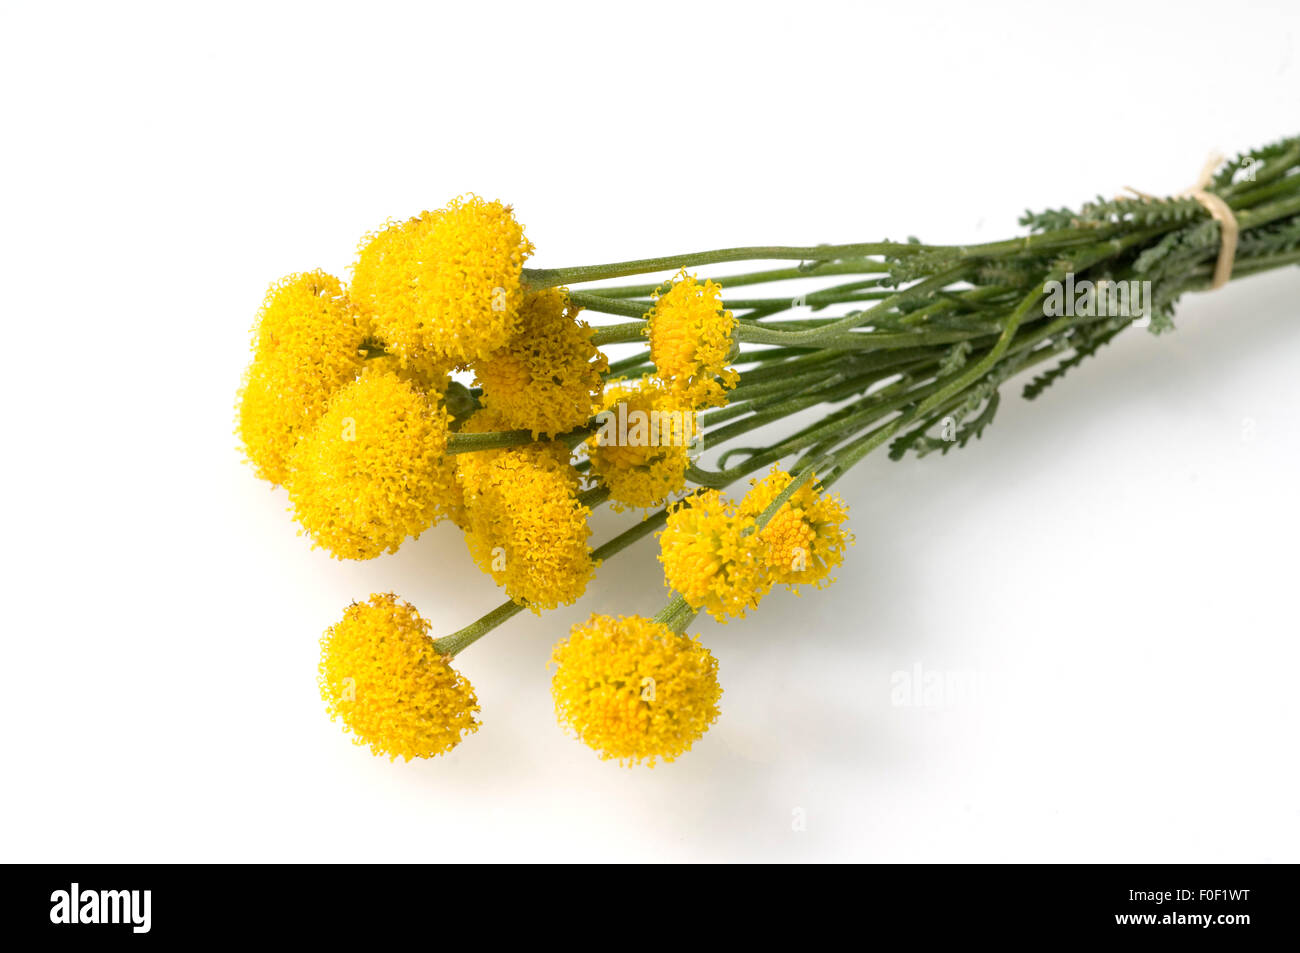 Santolina chamaecyparissus Heiligenkraut Lemon Fizz